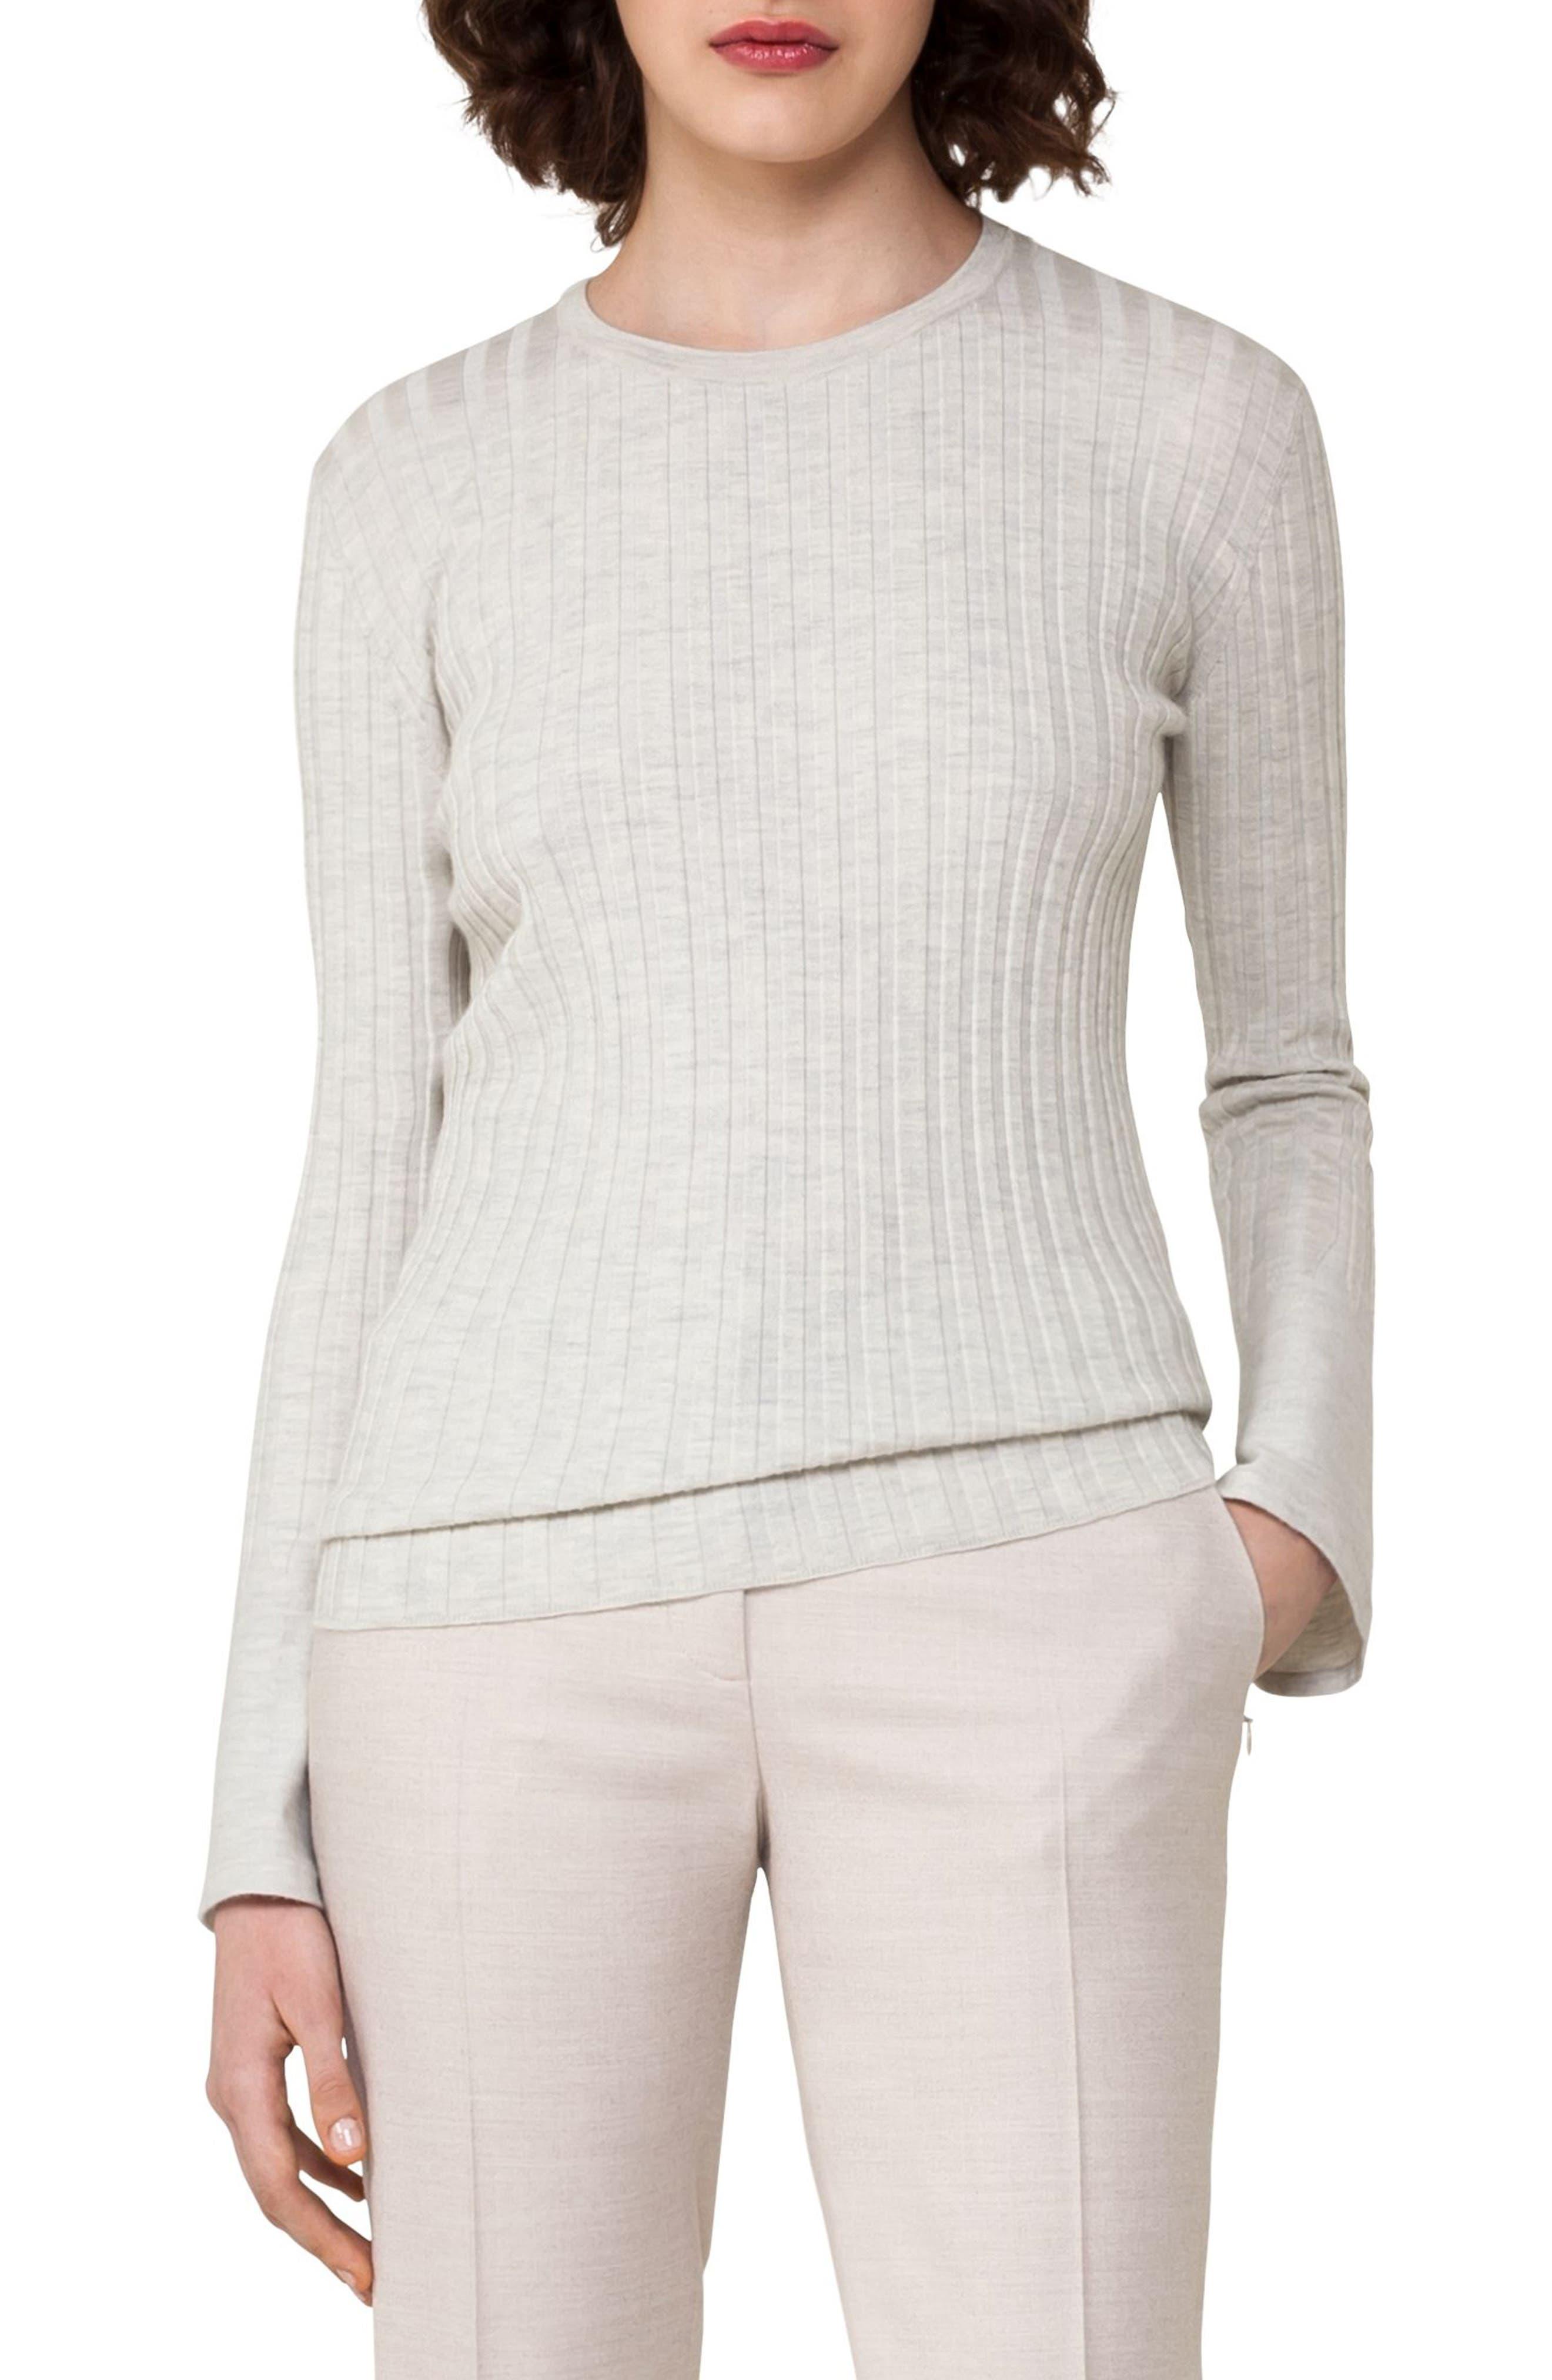 Main Image - Akris Rib Knit Stretch Cashmere & Silk Top